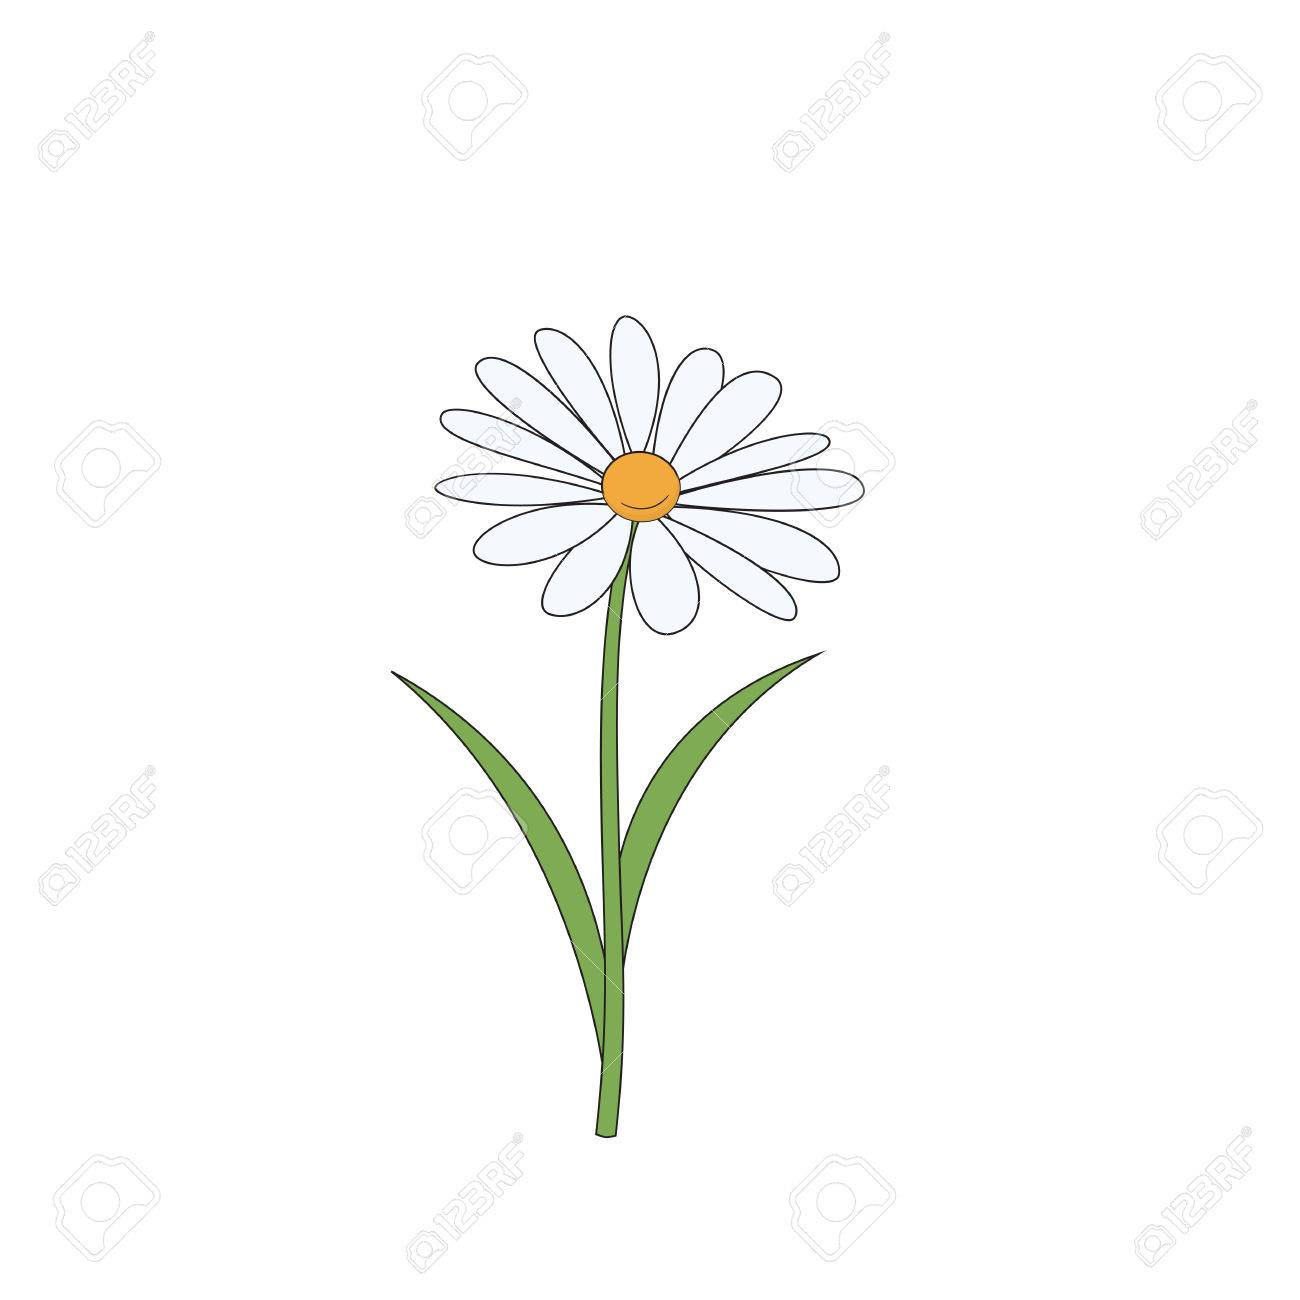 Cartoon daisy. Simple flower on white background. Vector illustration. - 76081580